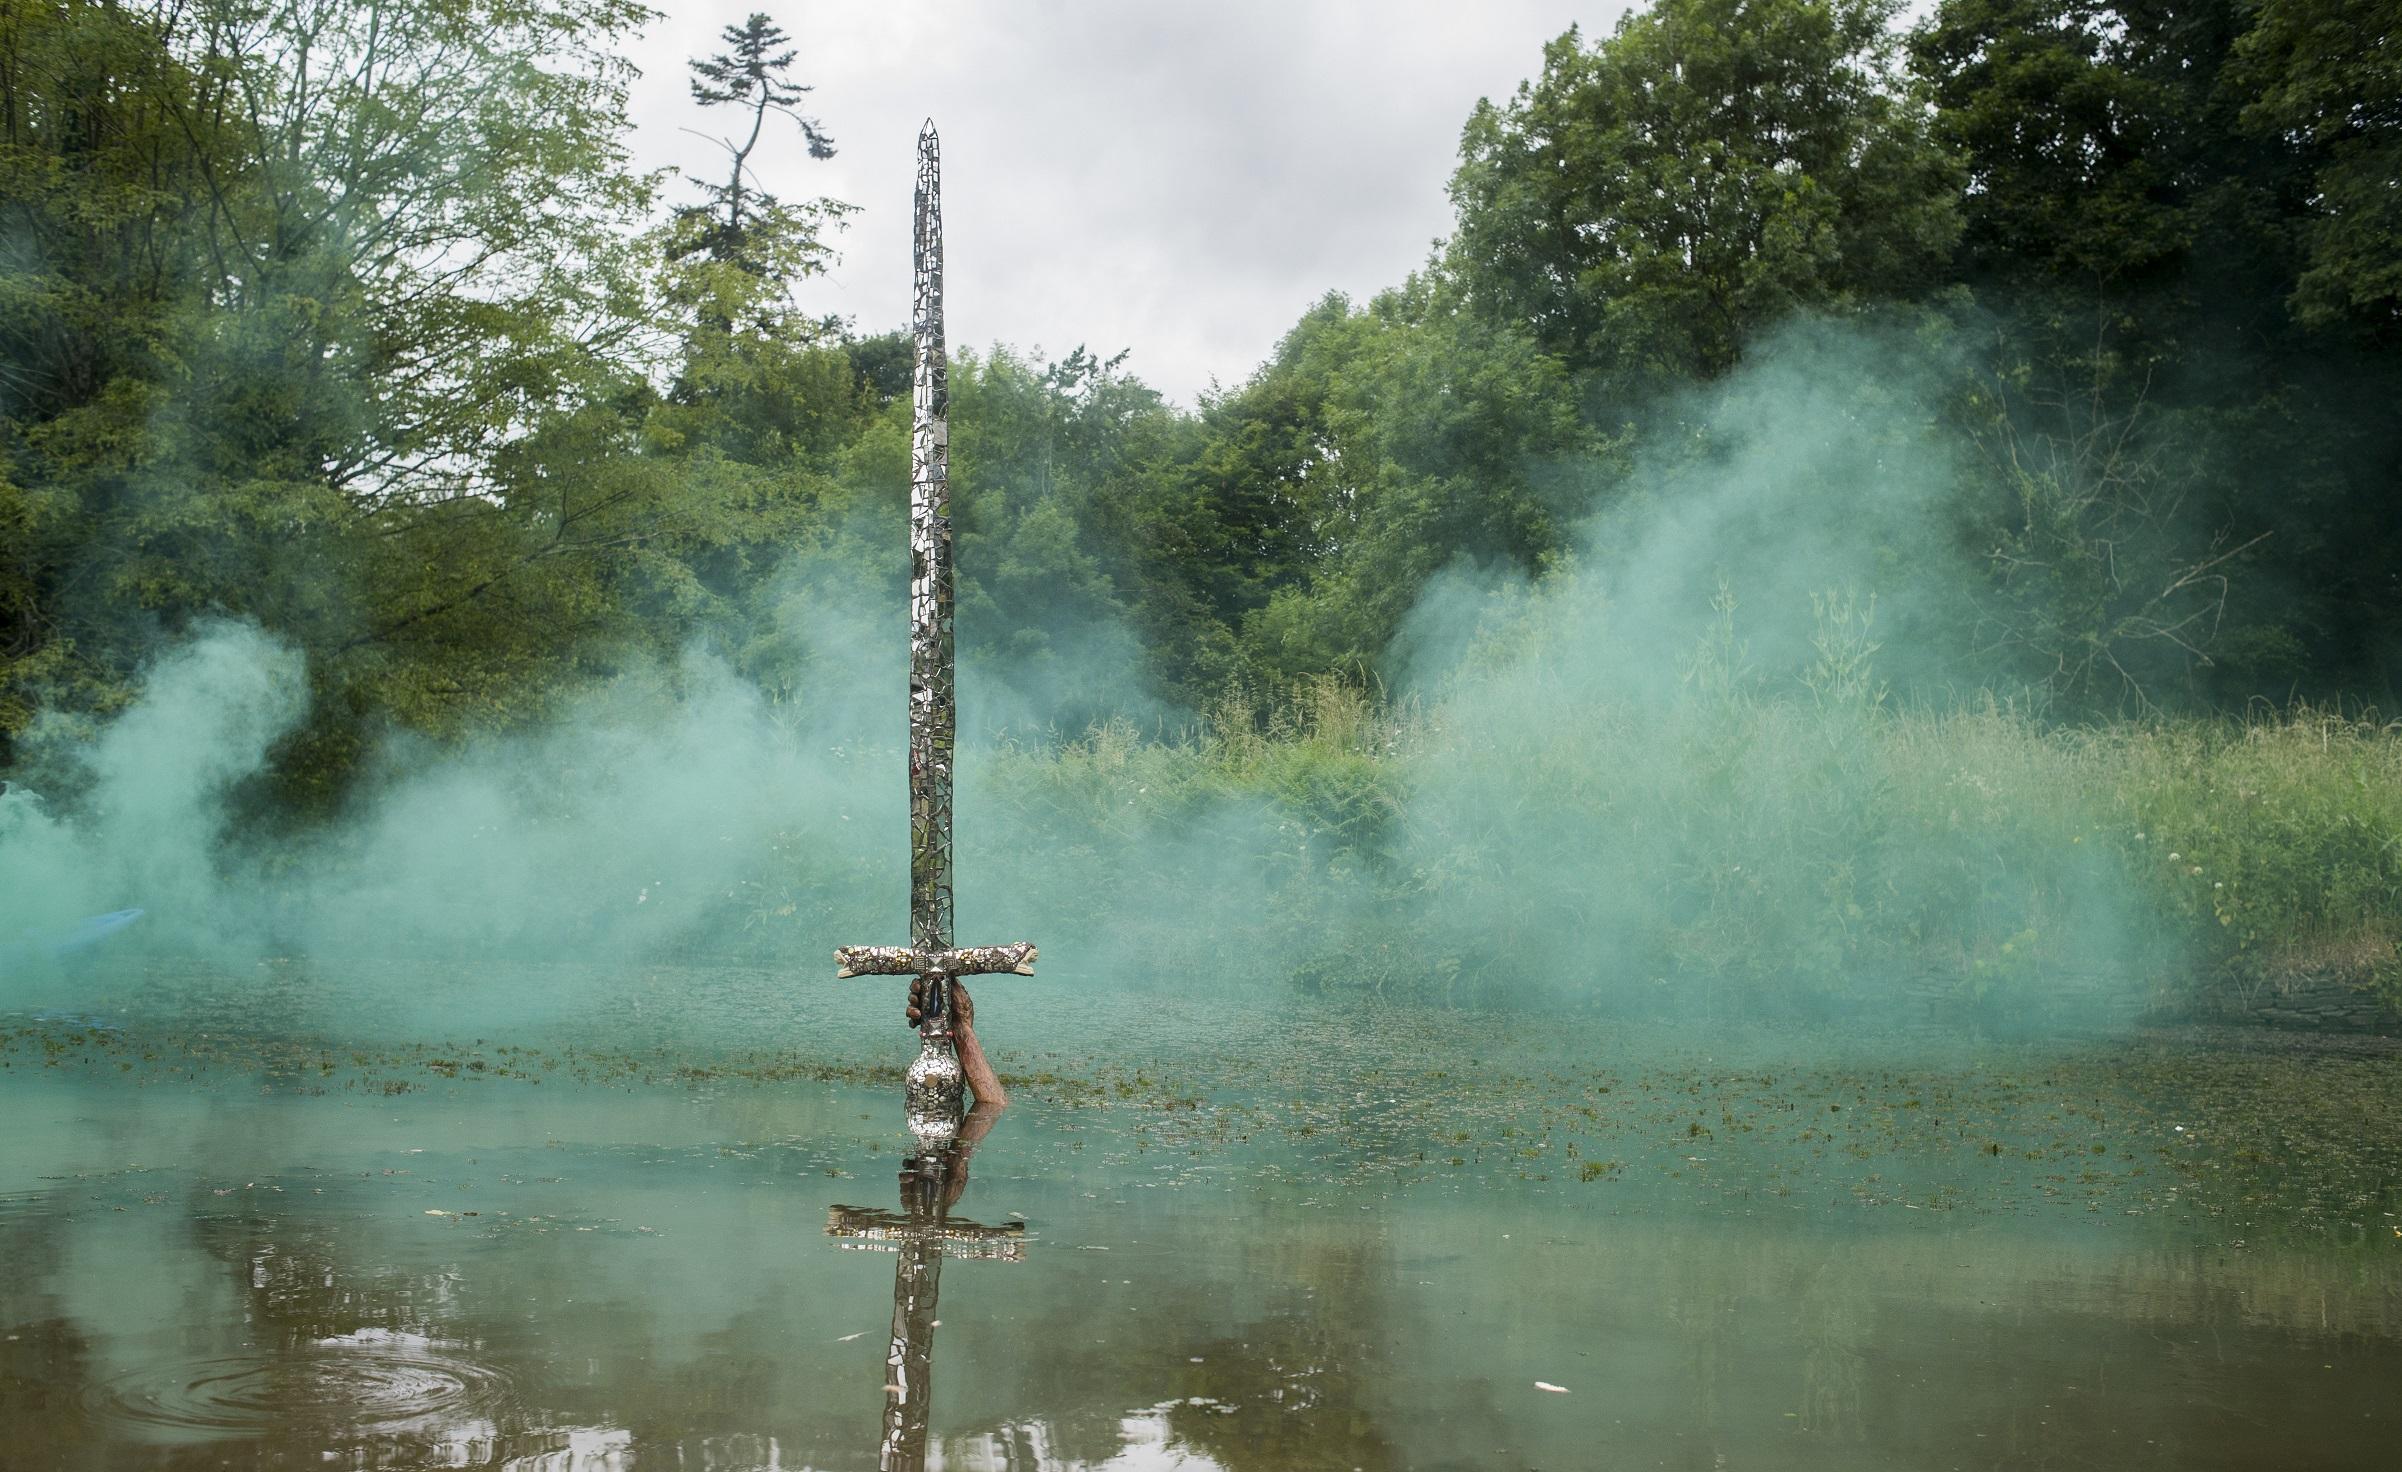 Excalibur by Steve HaywoodNational Trust